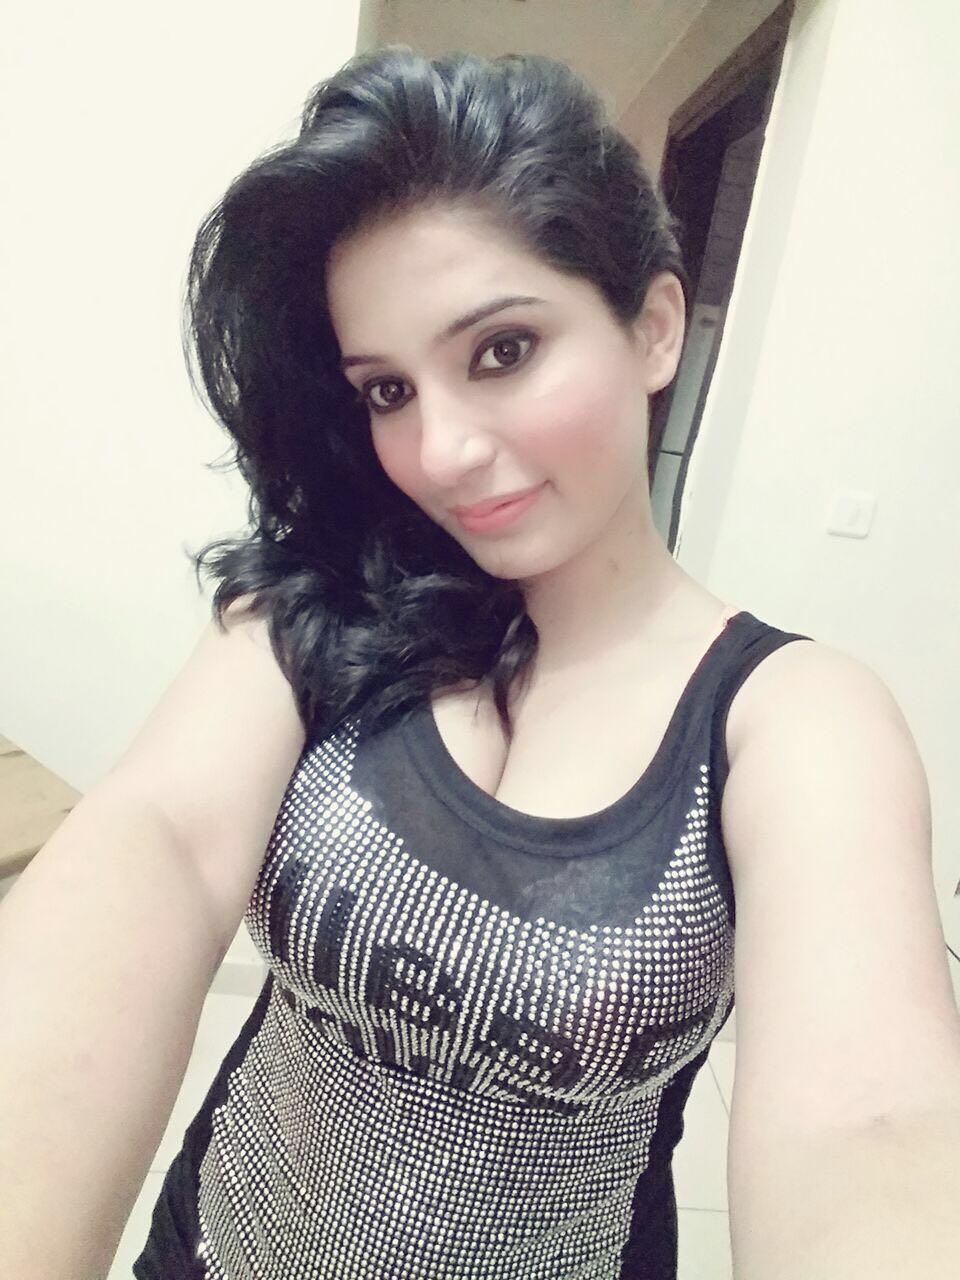 email mature indian escort models dubai jpg 1152x768